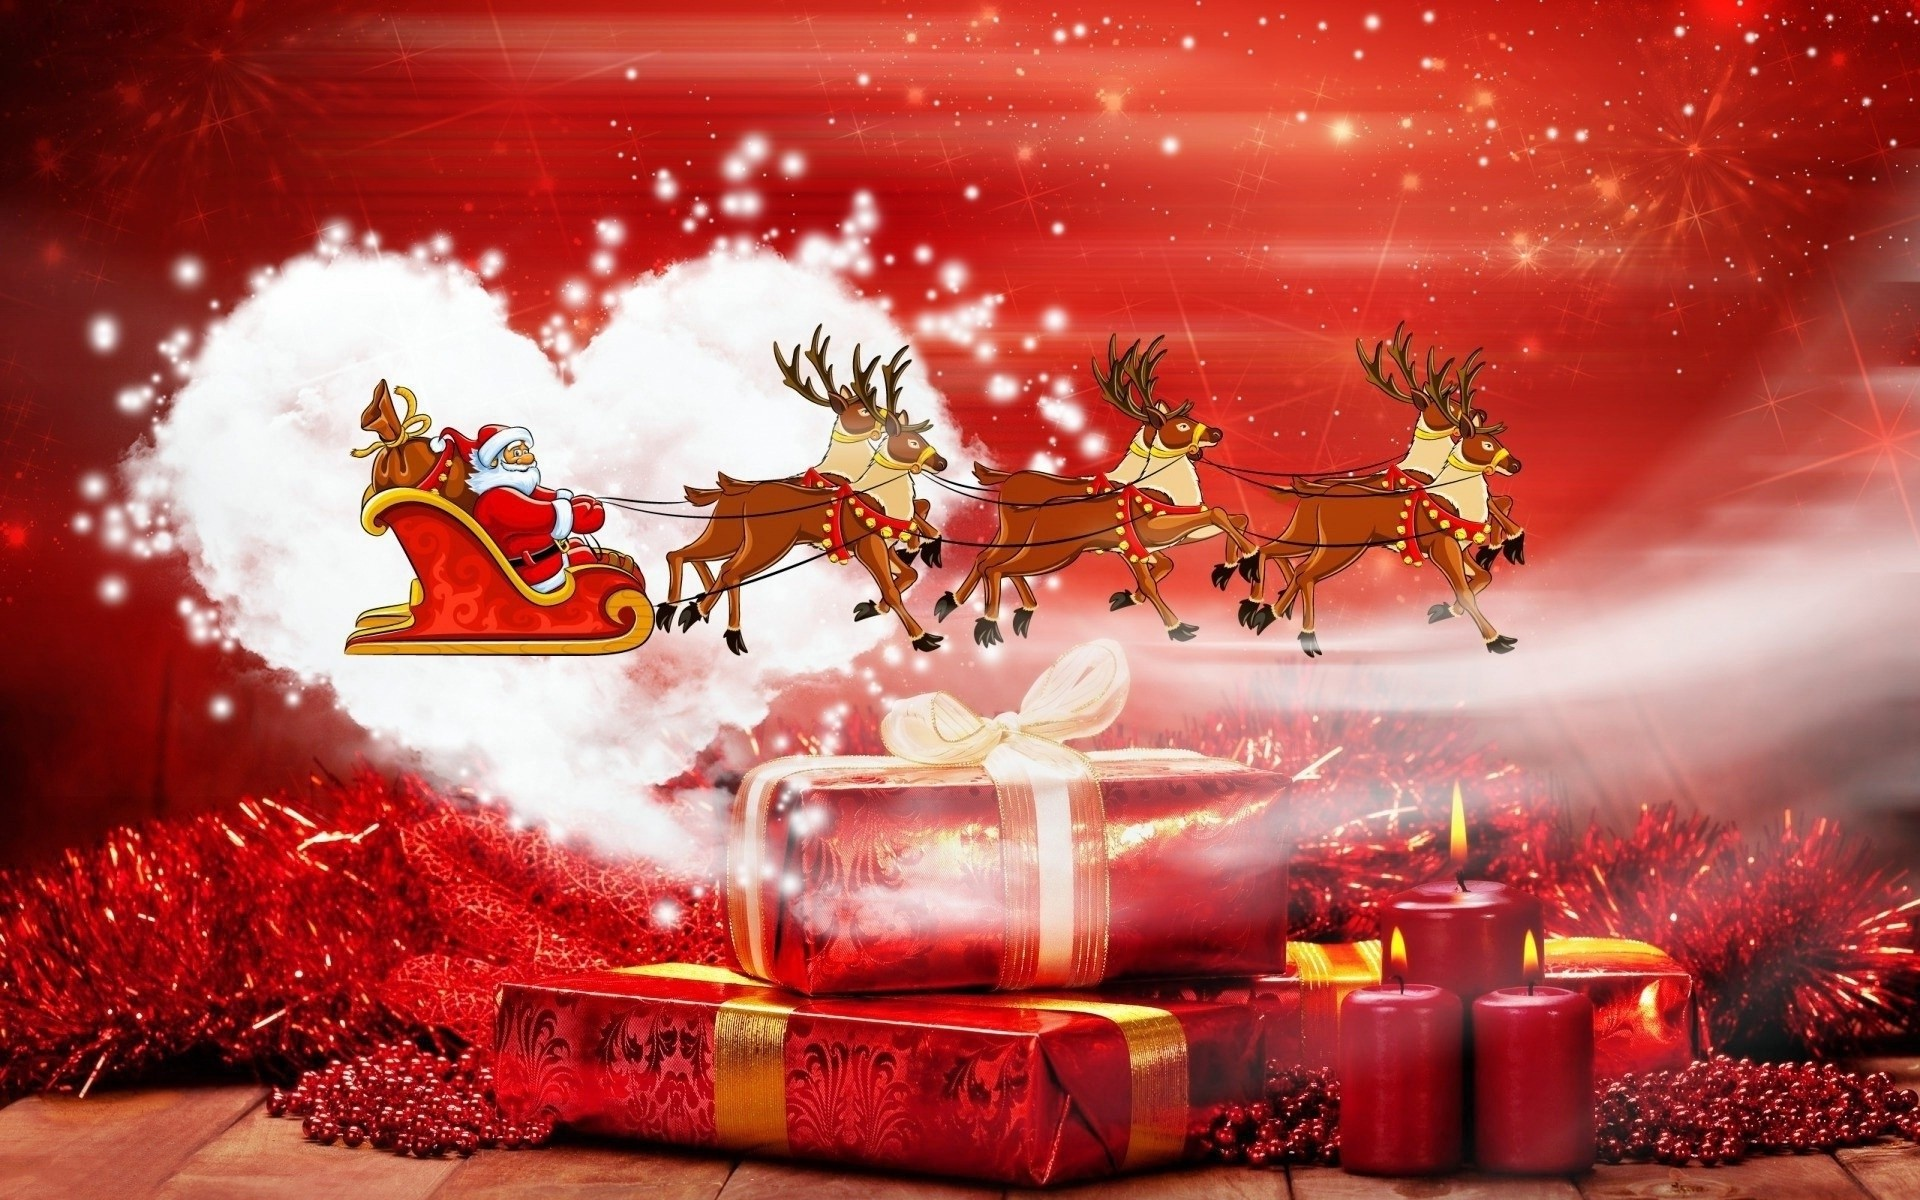 Santa Claus Wallpapers (73+ Images